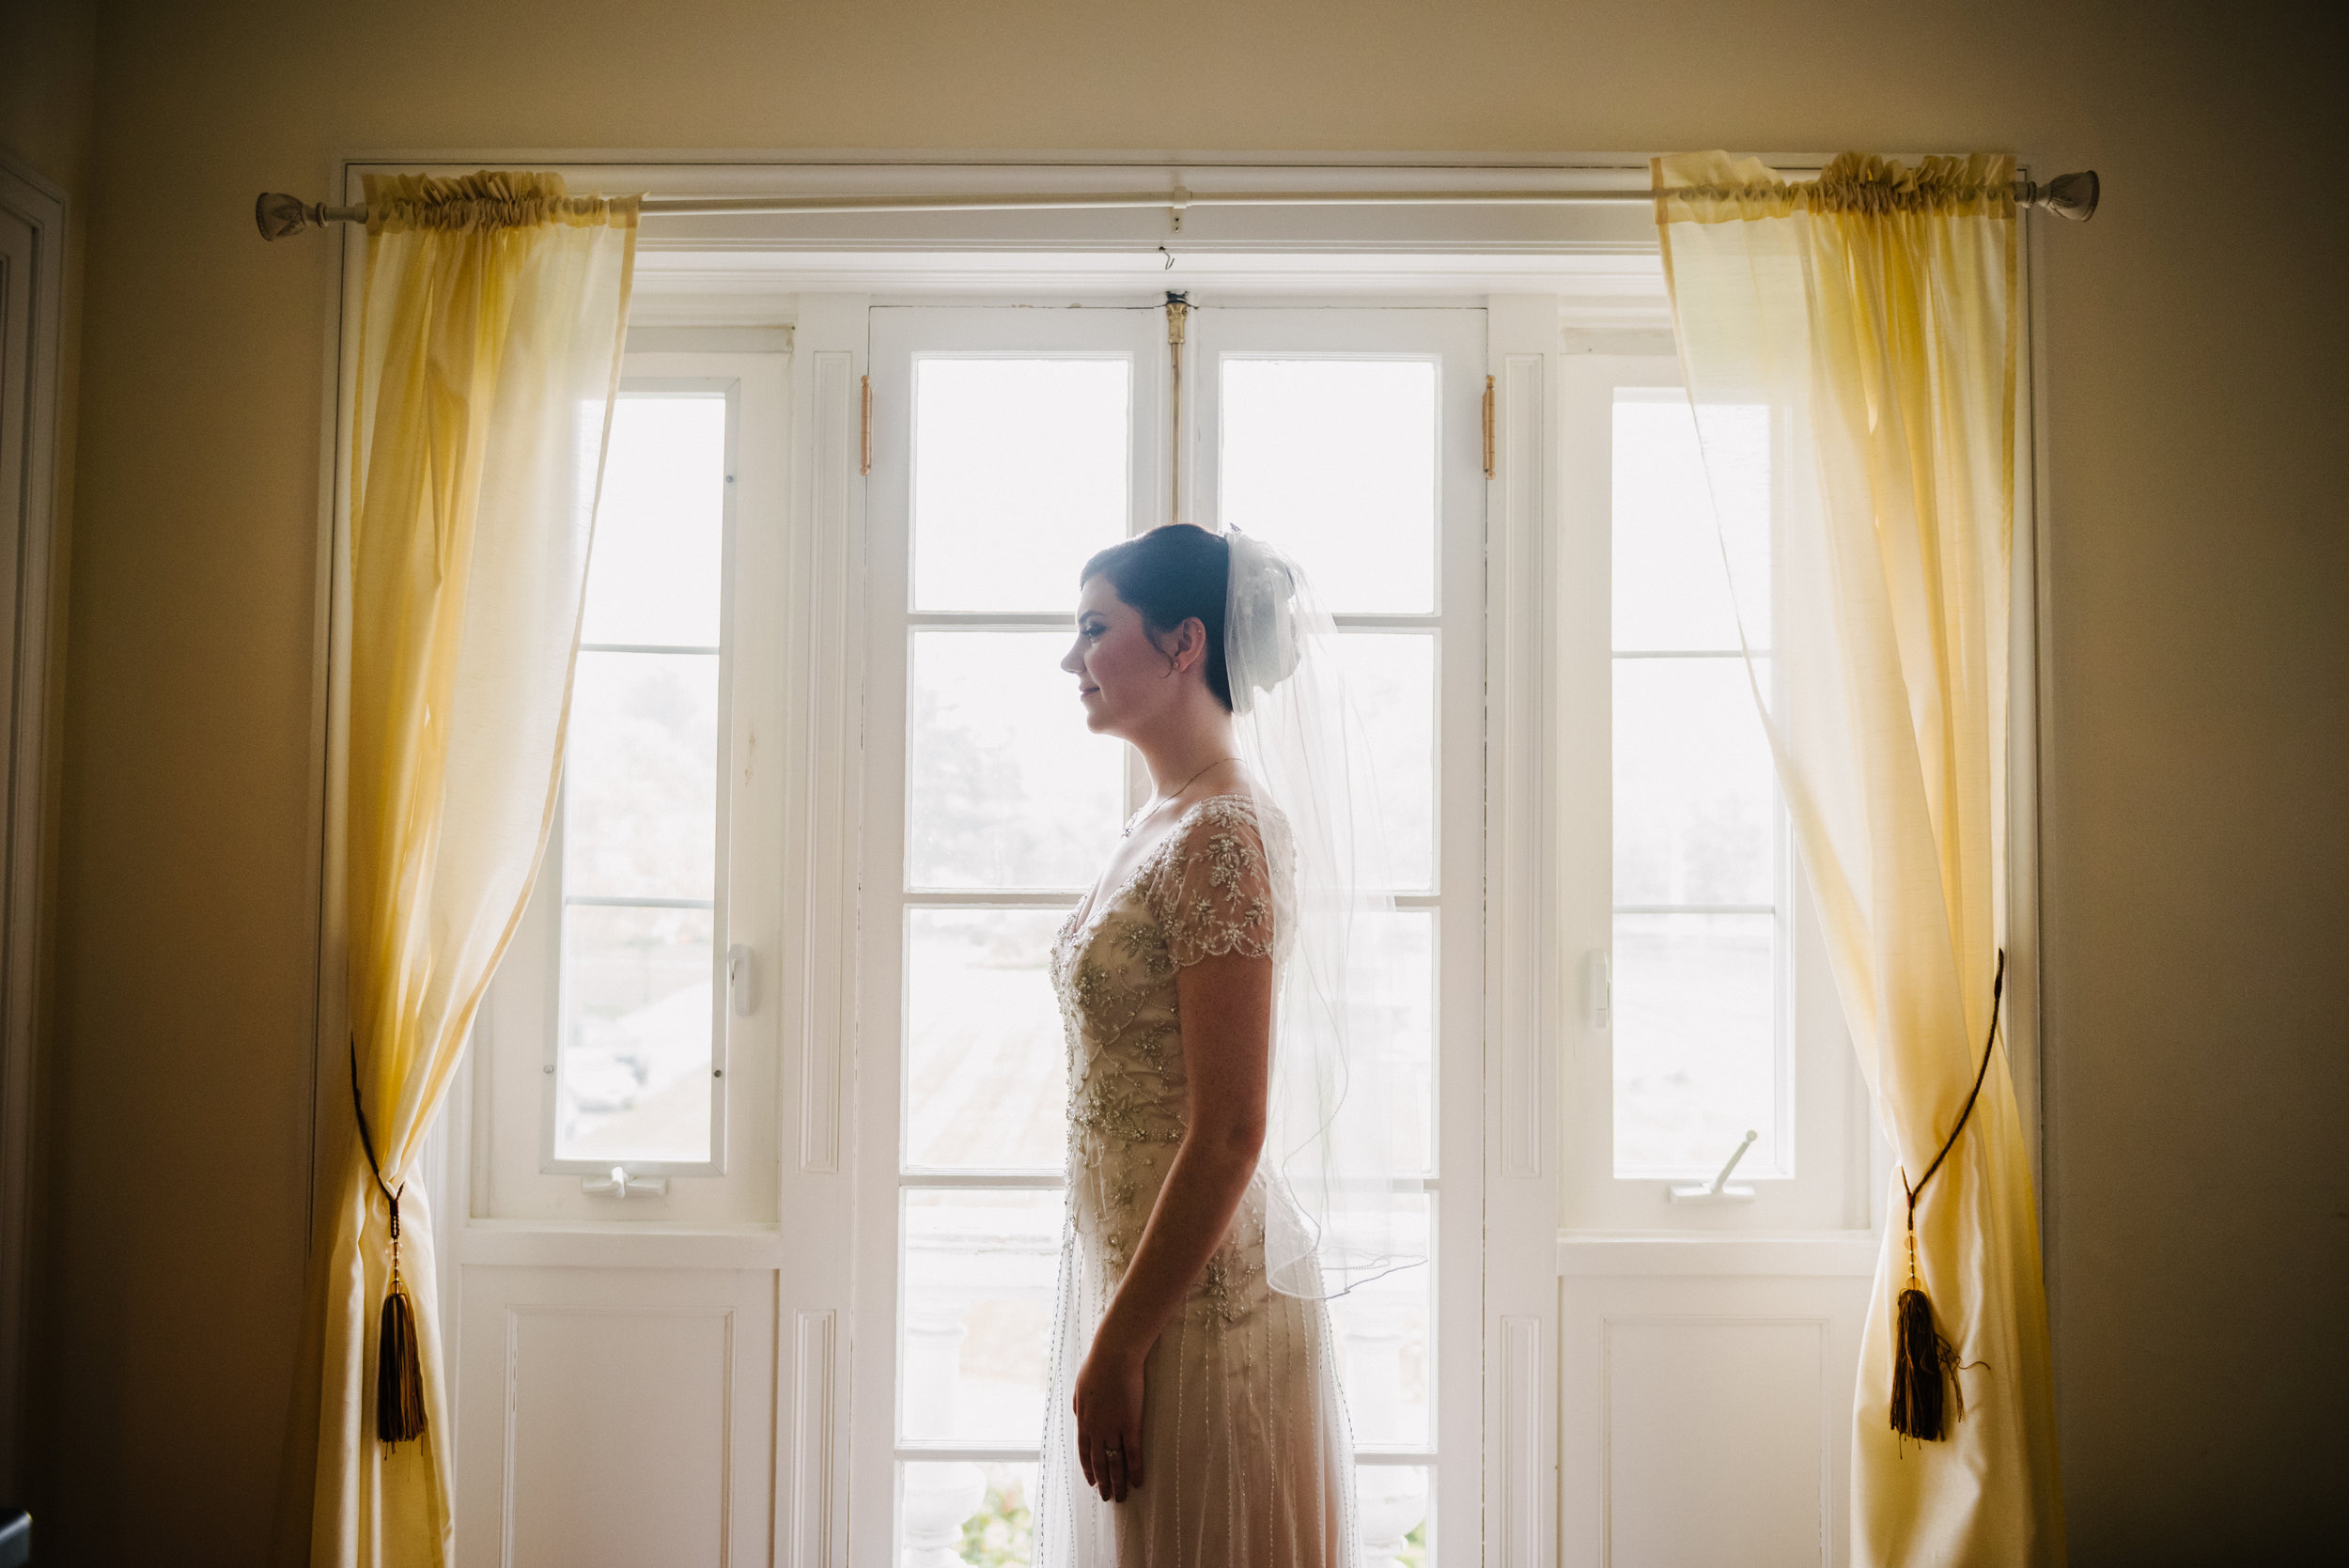 24_tupper manor wedding fifty one hale photography.jpg